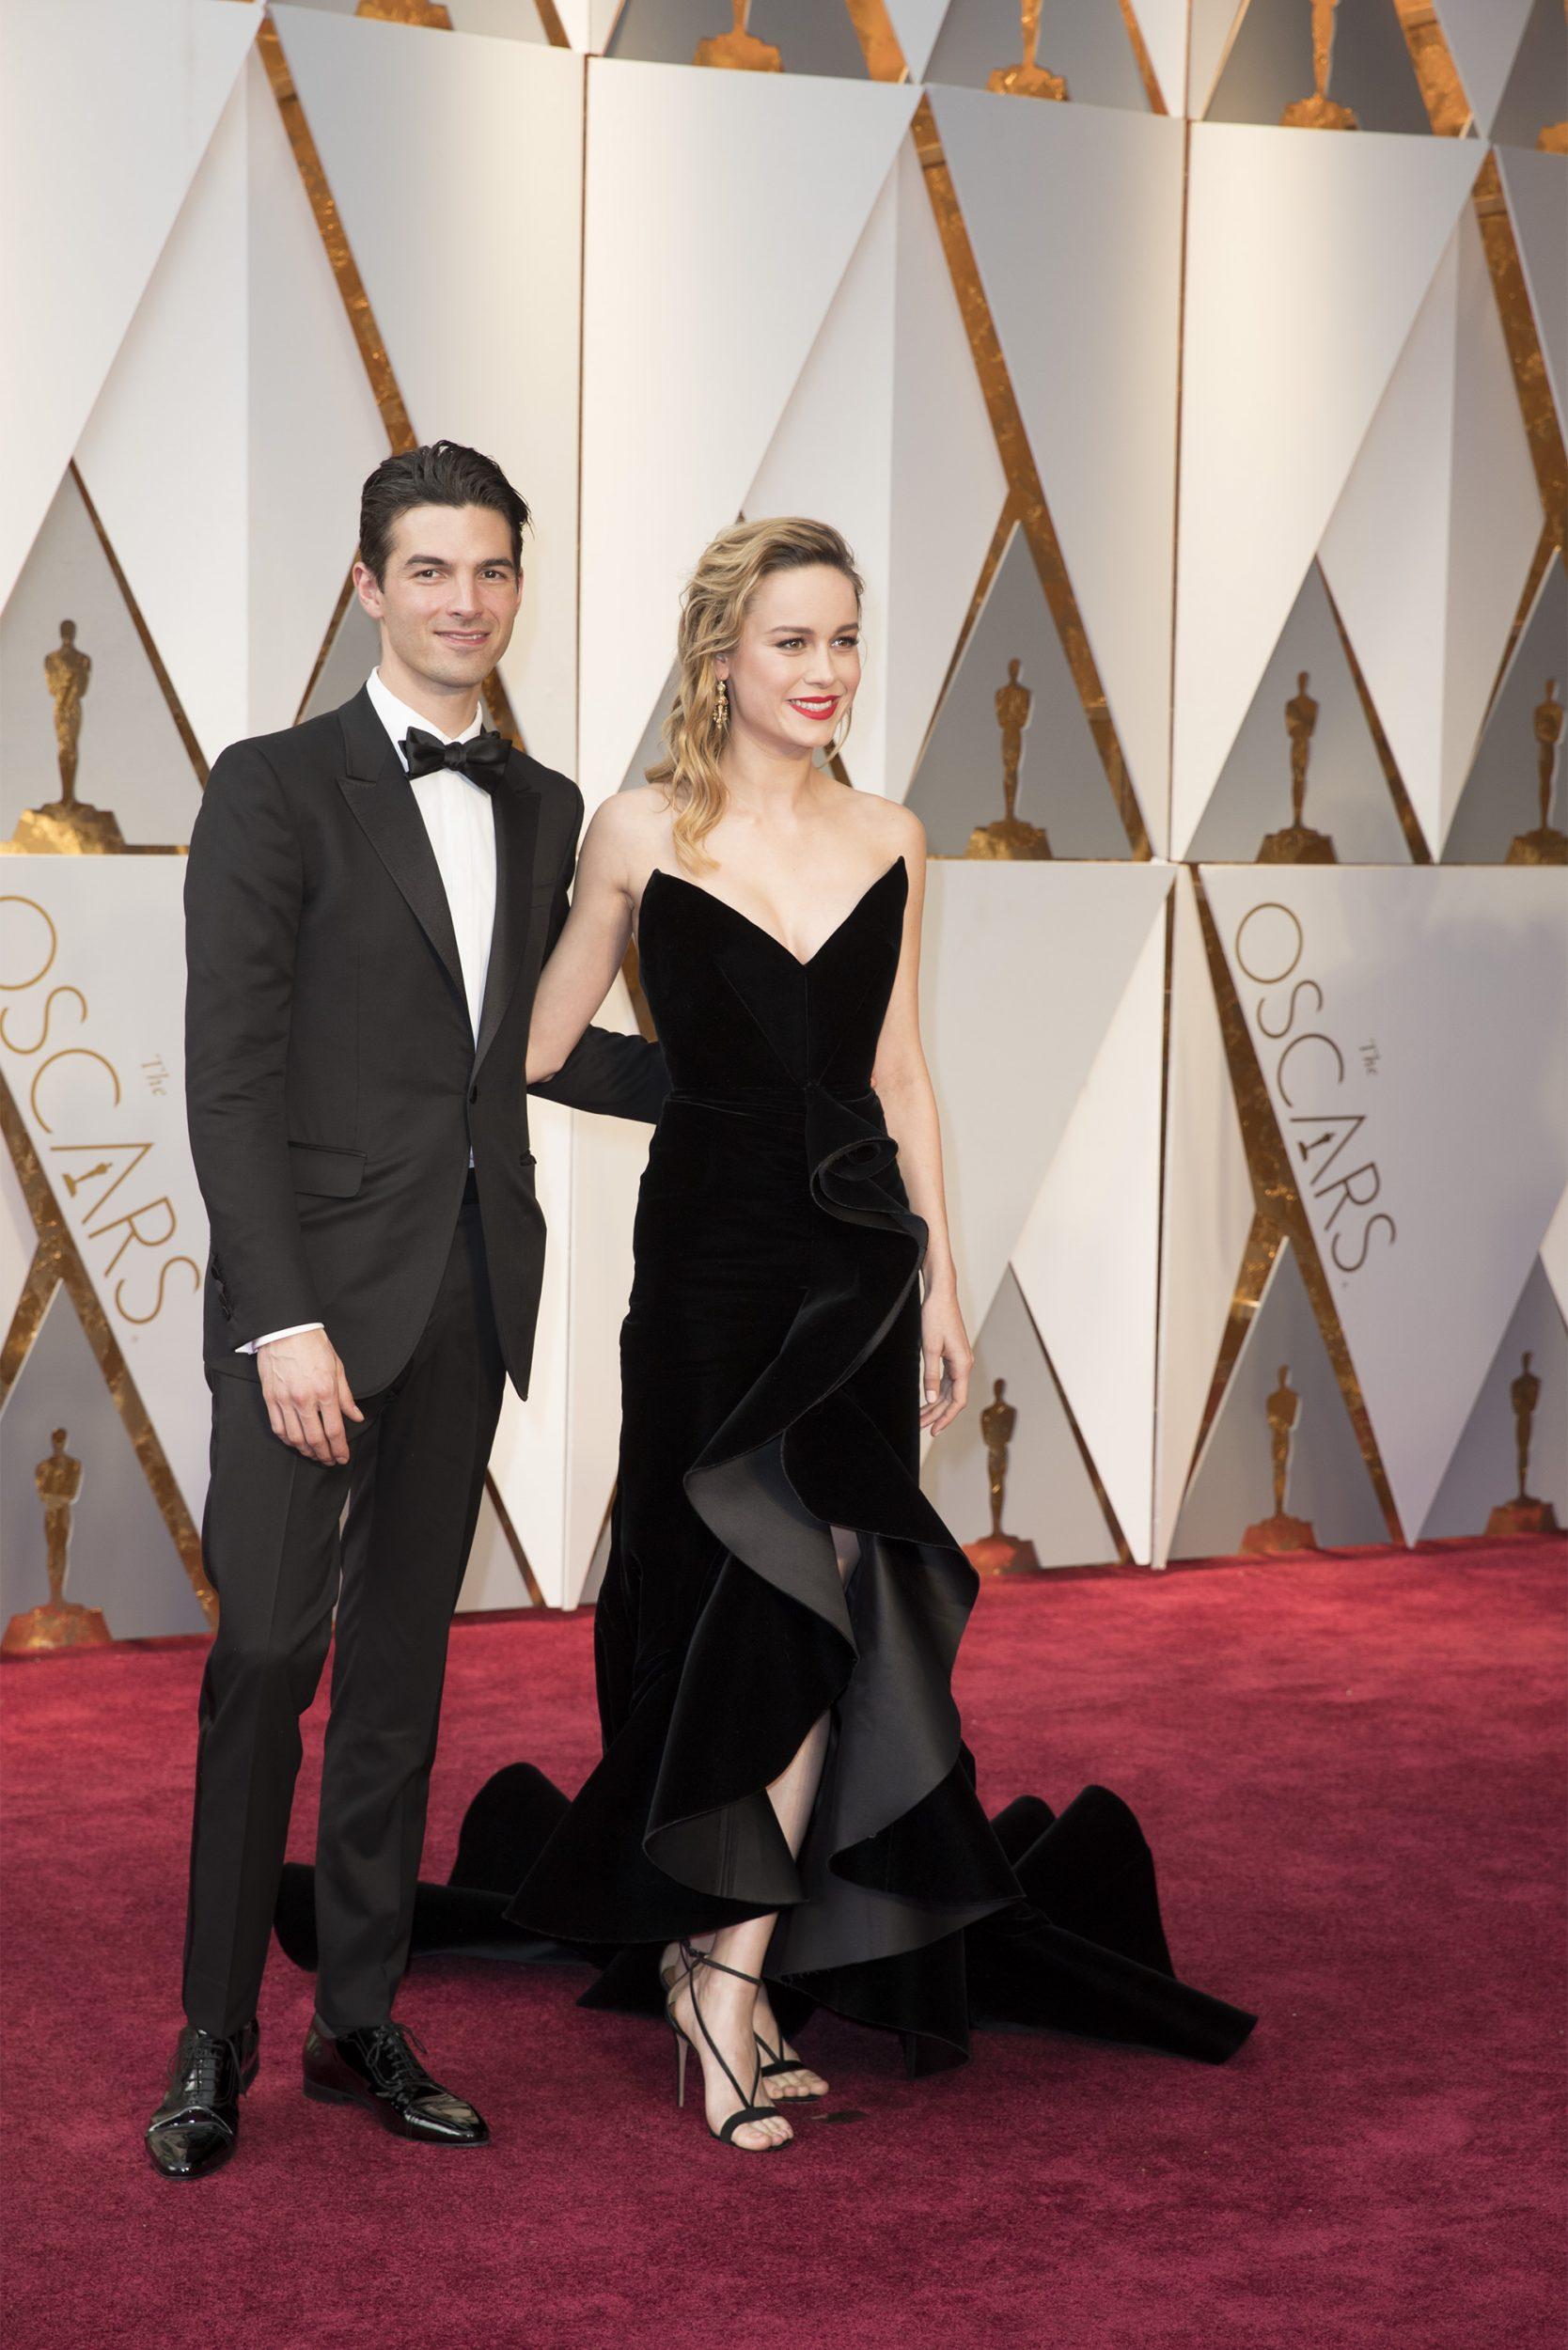 THE OSCARS(r) - The 89th Oscars(r)  broadcasts live on Oscar(r) SUNDAY, FEBRUARY 26, 2017, on the ABC Television Network. (ABC/Tyler Golden) BRIE LARSON